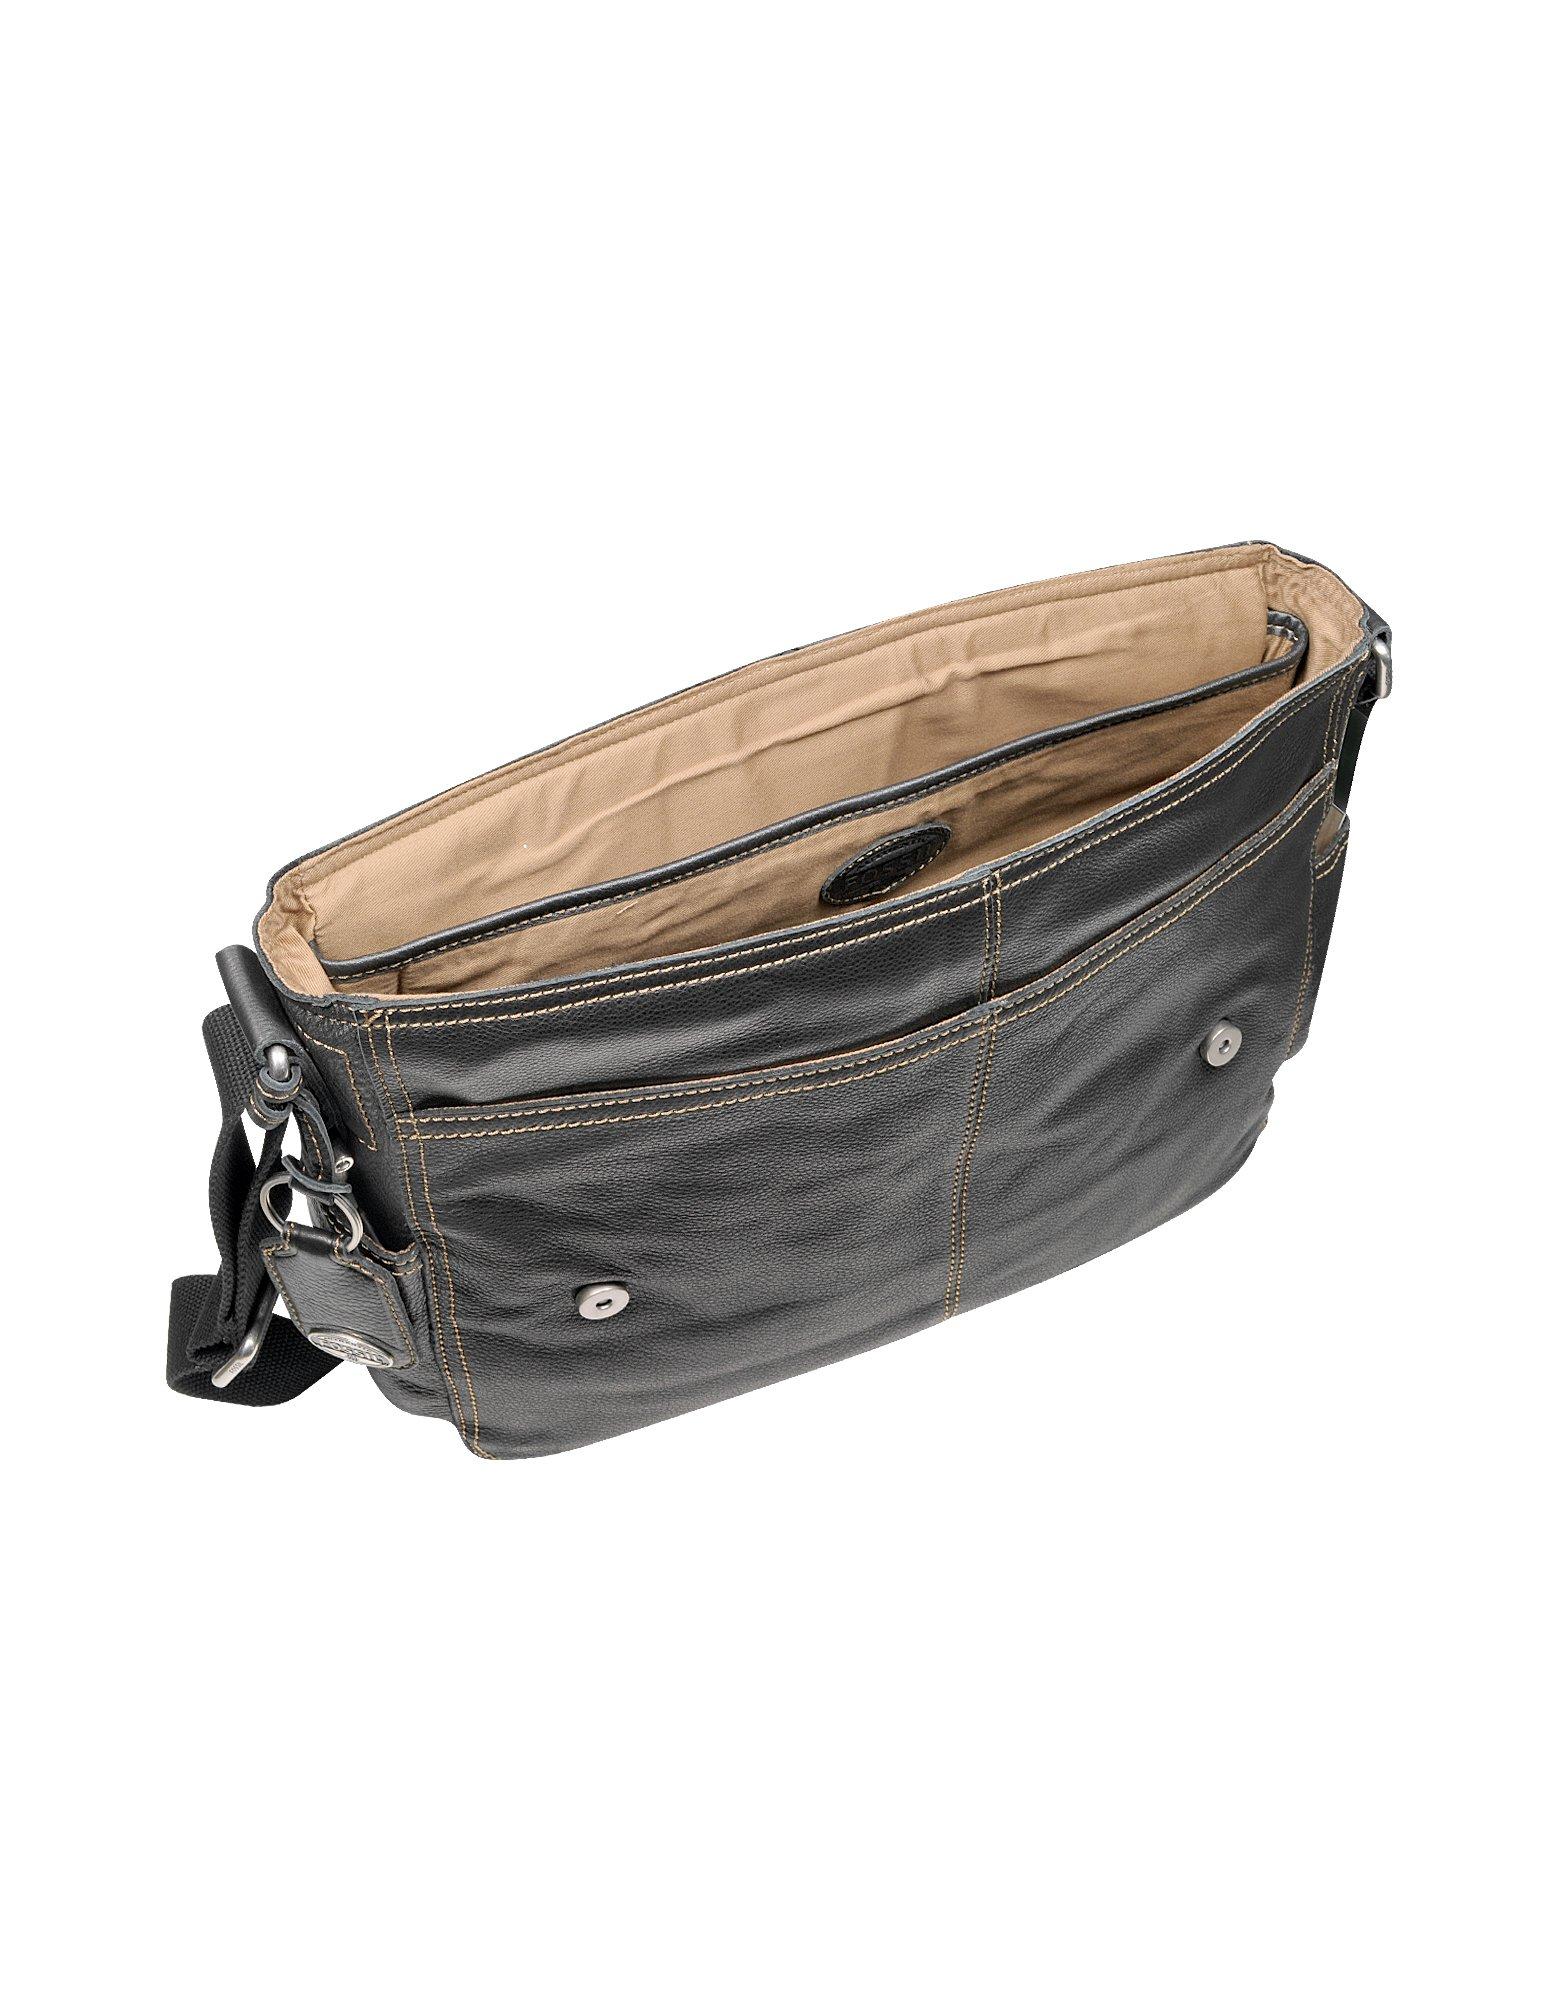 Lyst Fossil Desperado Ew Leather Laptop Messenger Bag